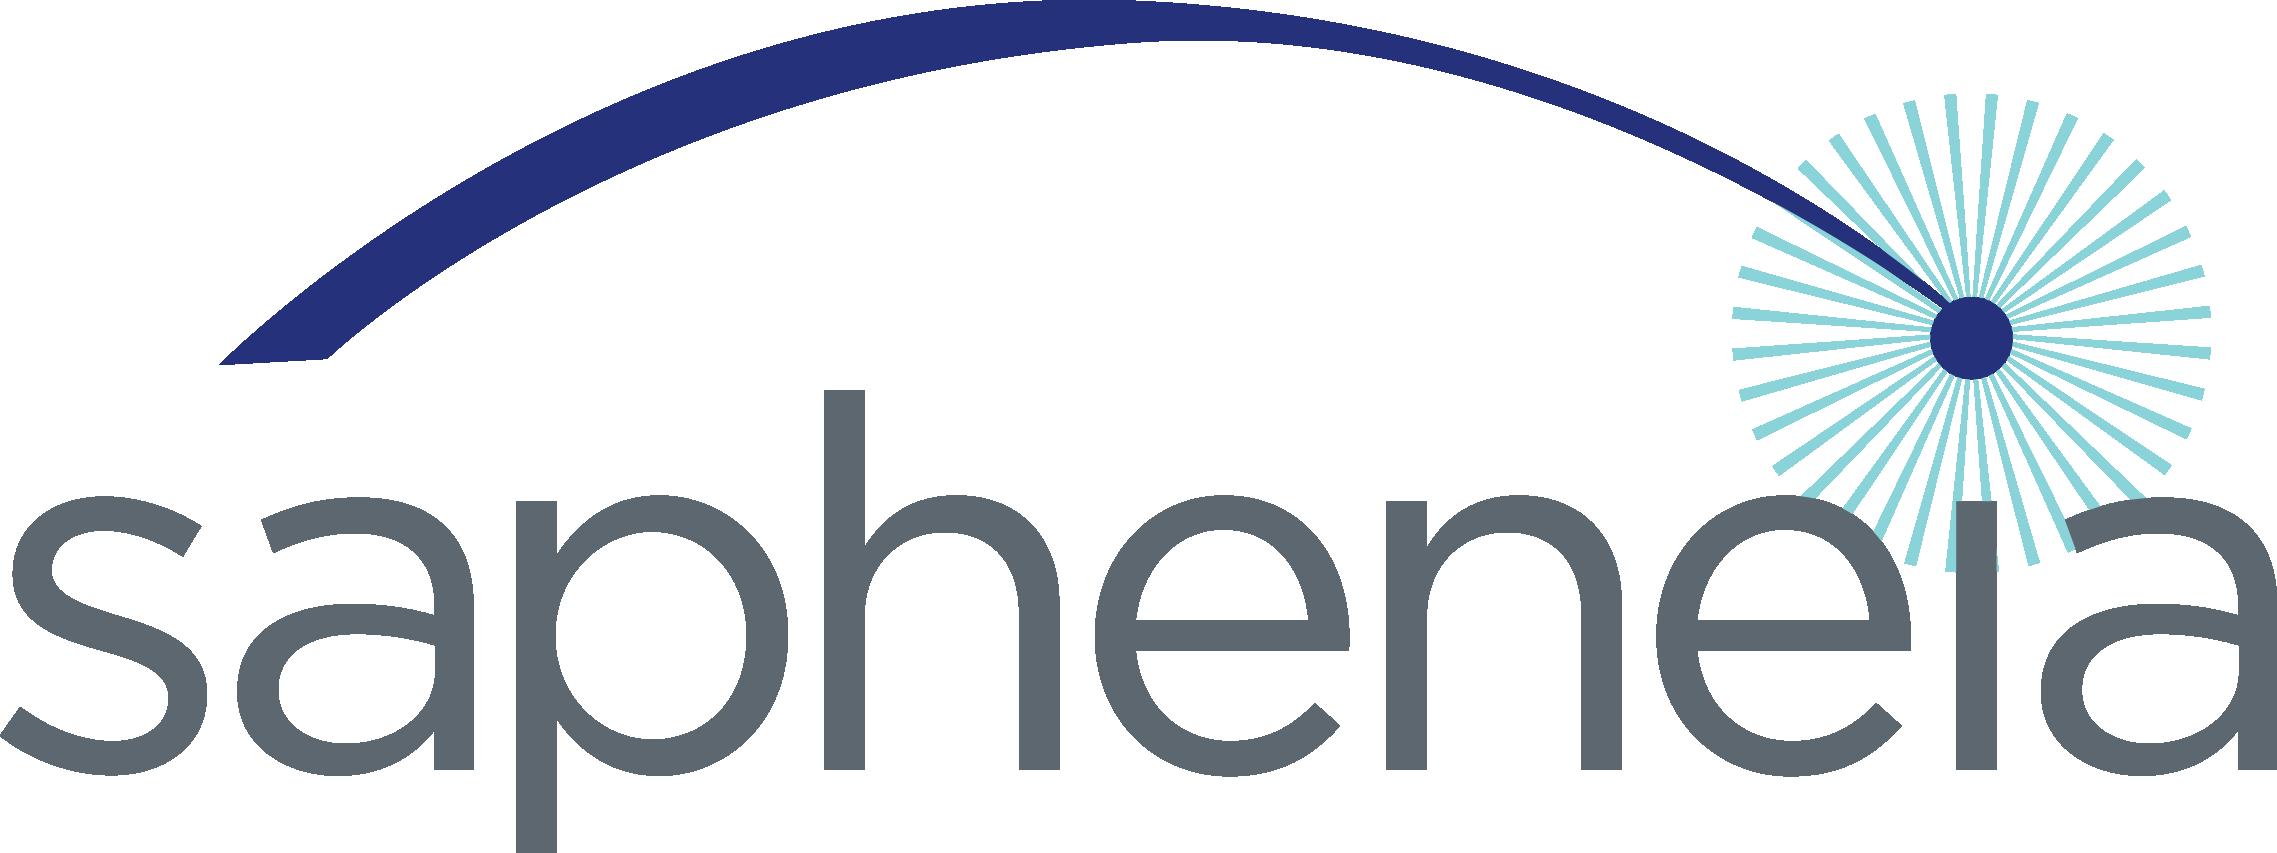 Sapheneia-logo-w-arc1